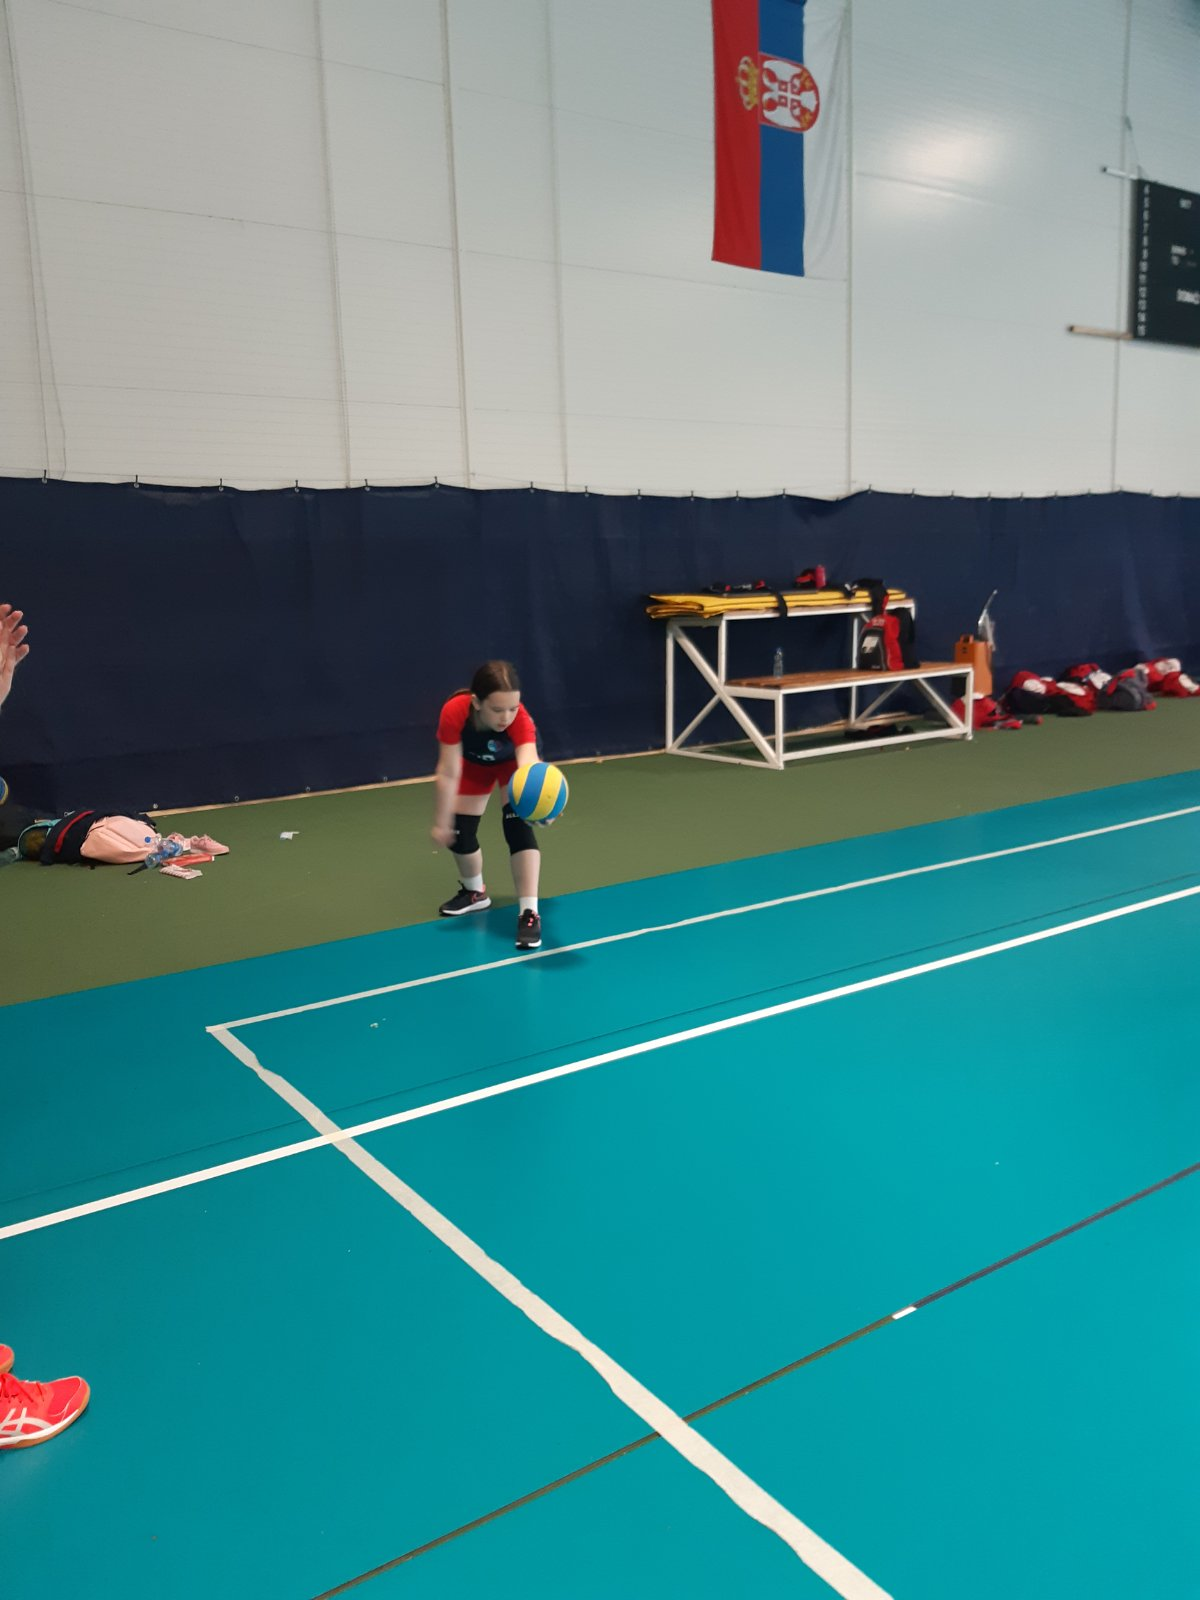 Utakmice   Mini Volley liga 2020/2021 - I/II kolo   OK NBG - 4